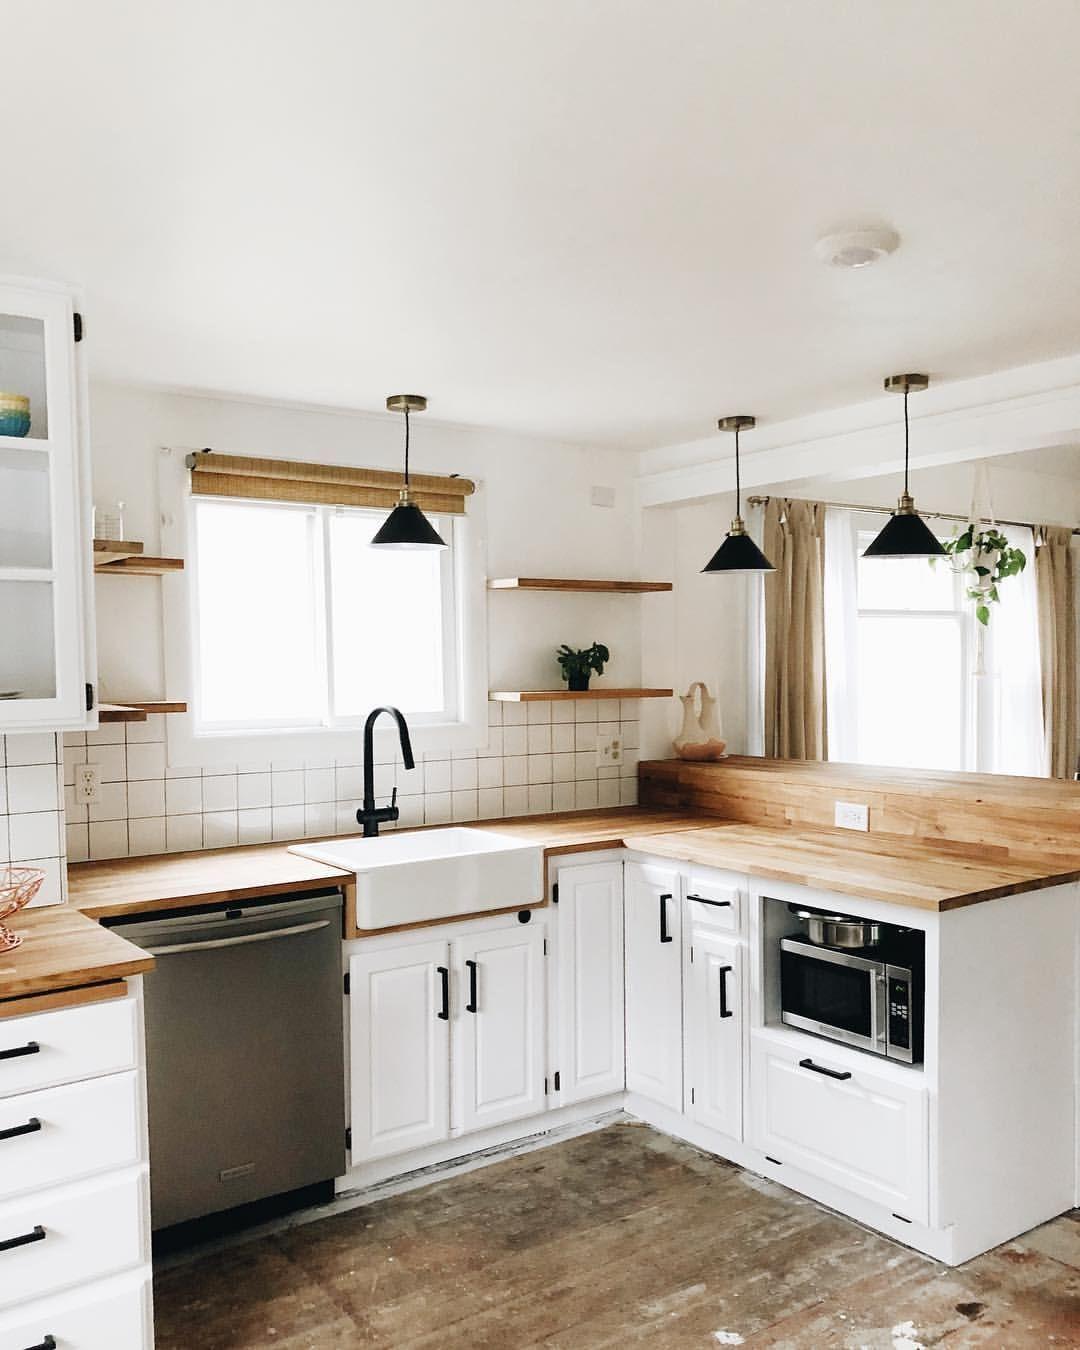 28 Small Kitchen Design Ideas: Baby Room Decoration